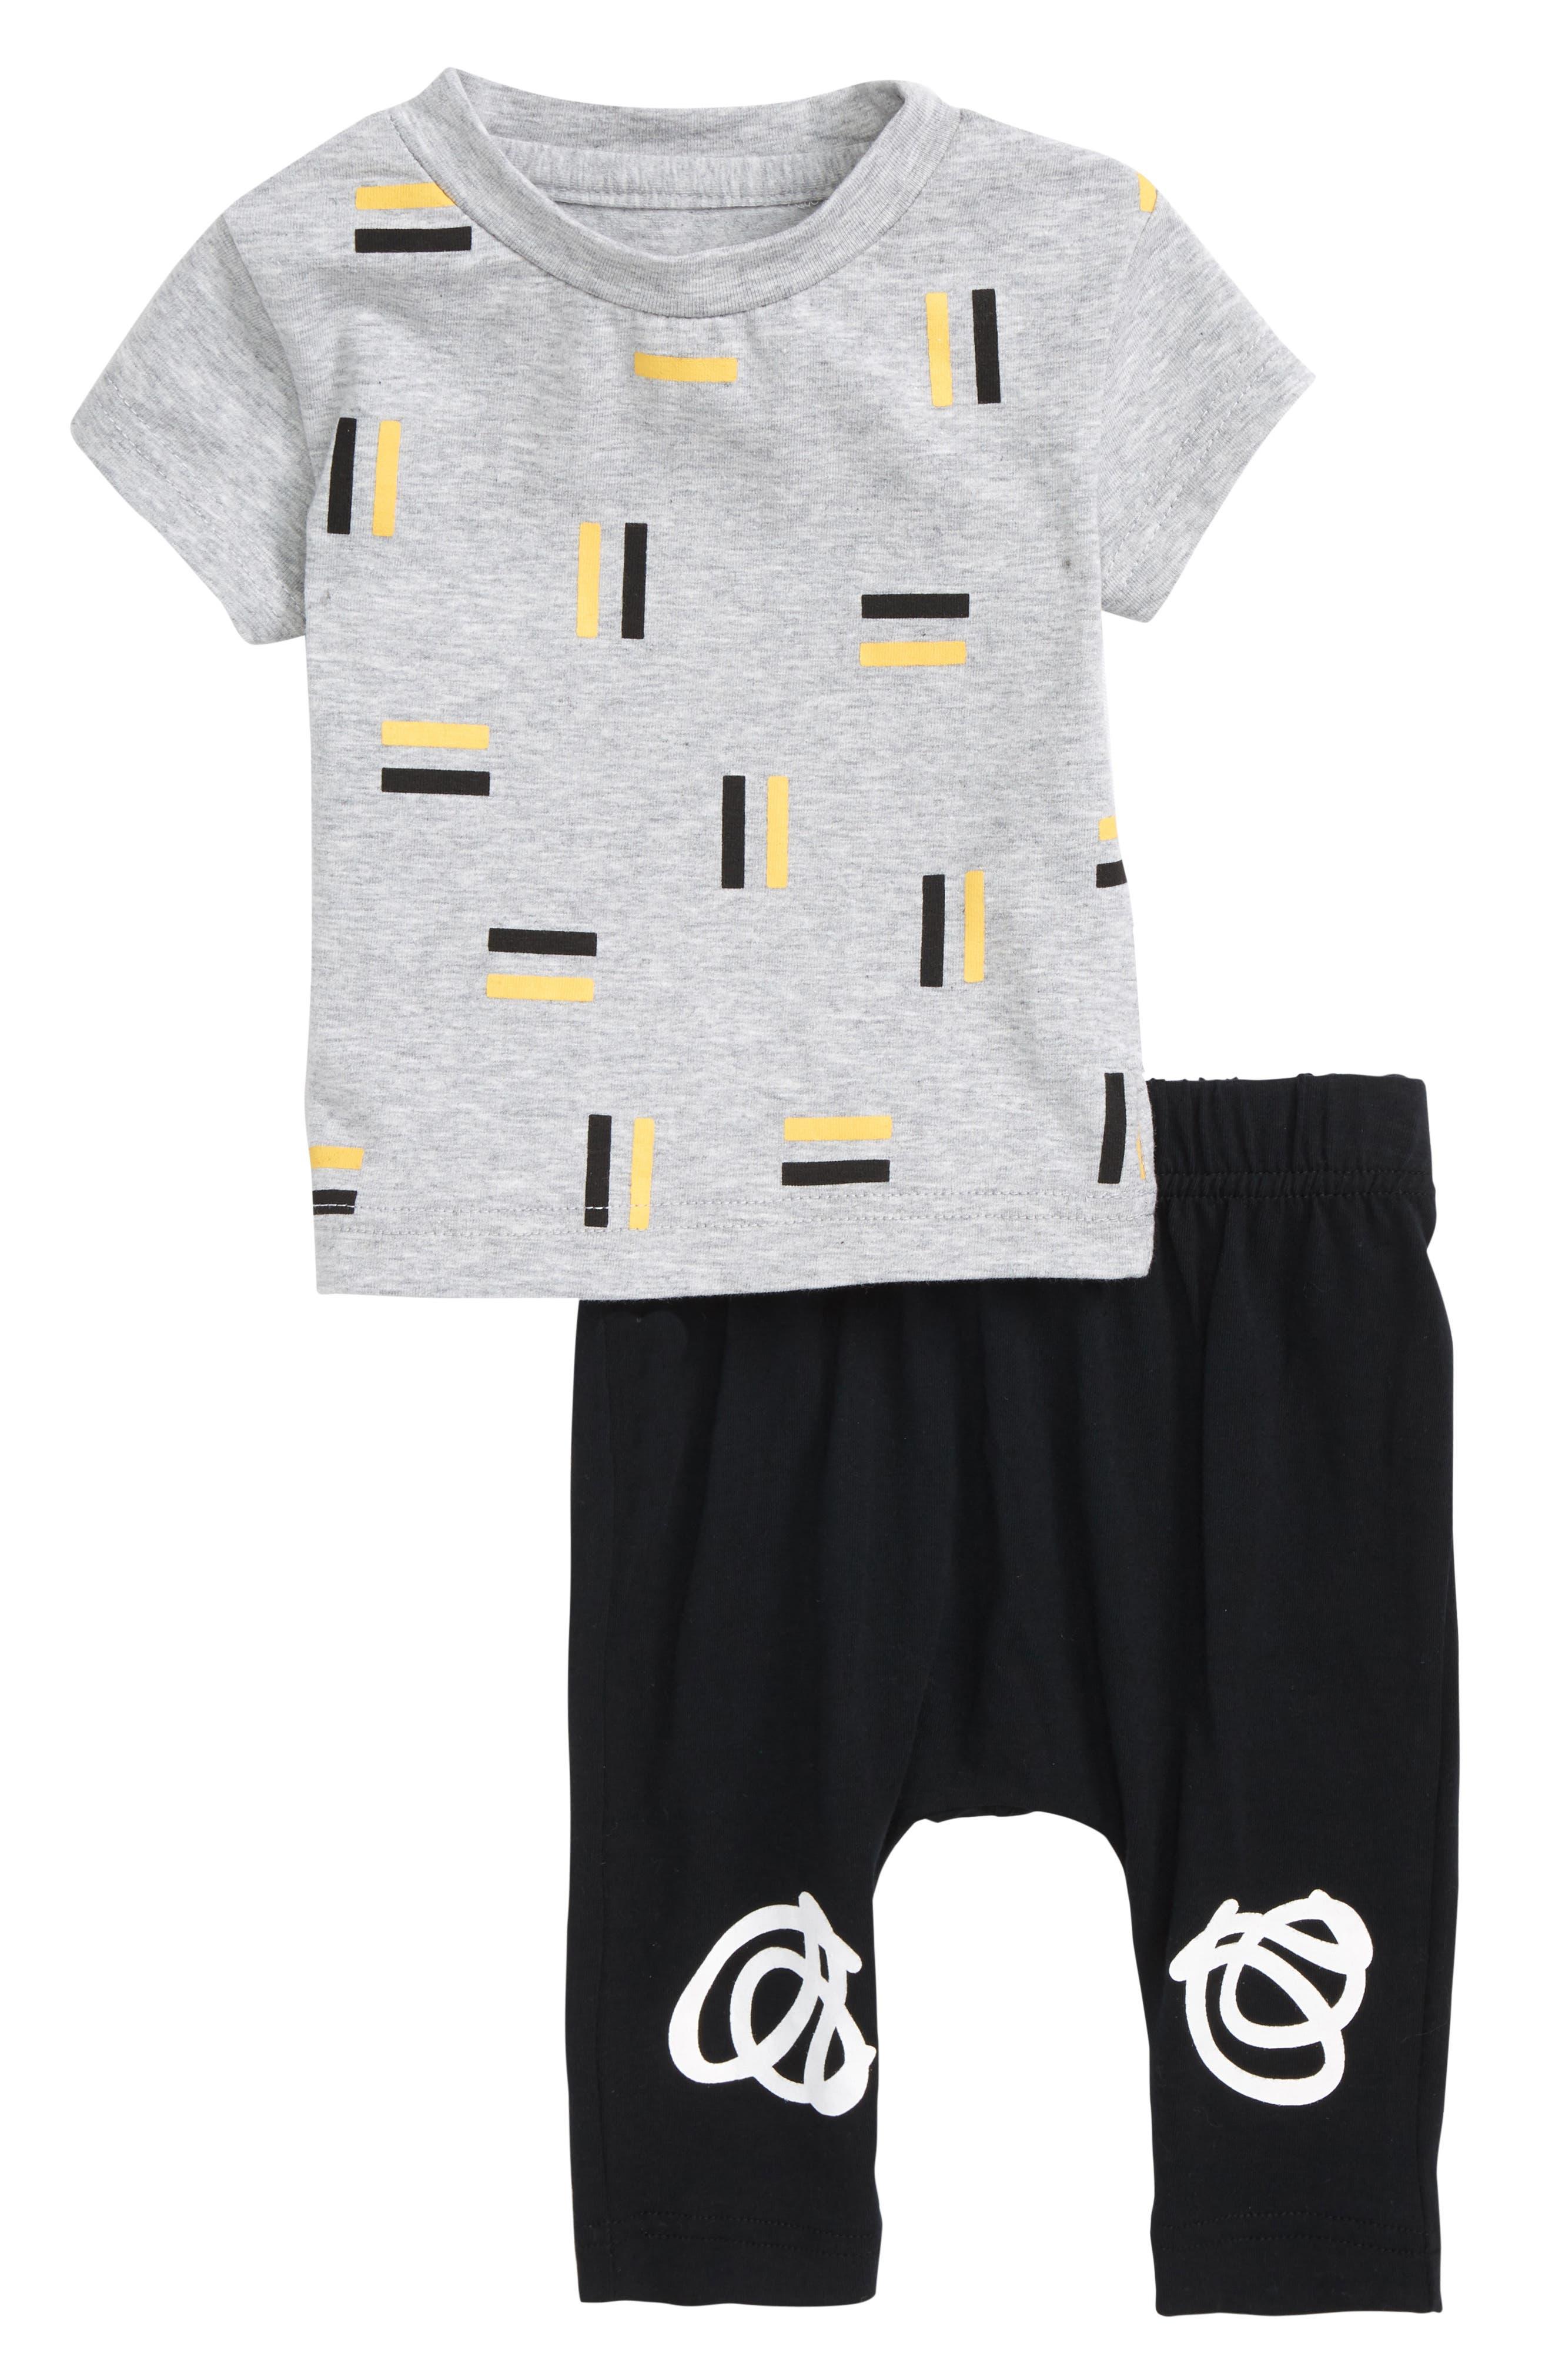 Pause Shirt & Pants Set,                         Main,                         color, Grey/ Black